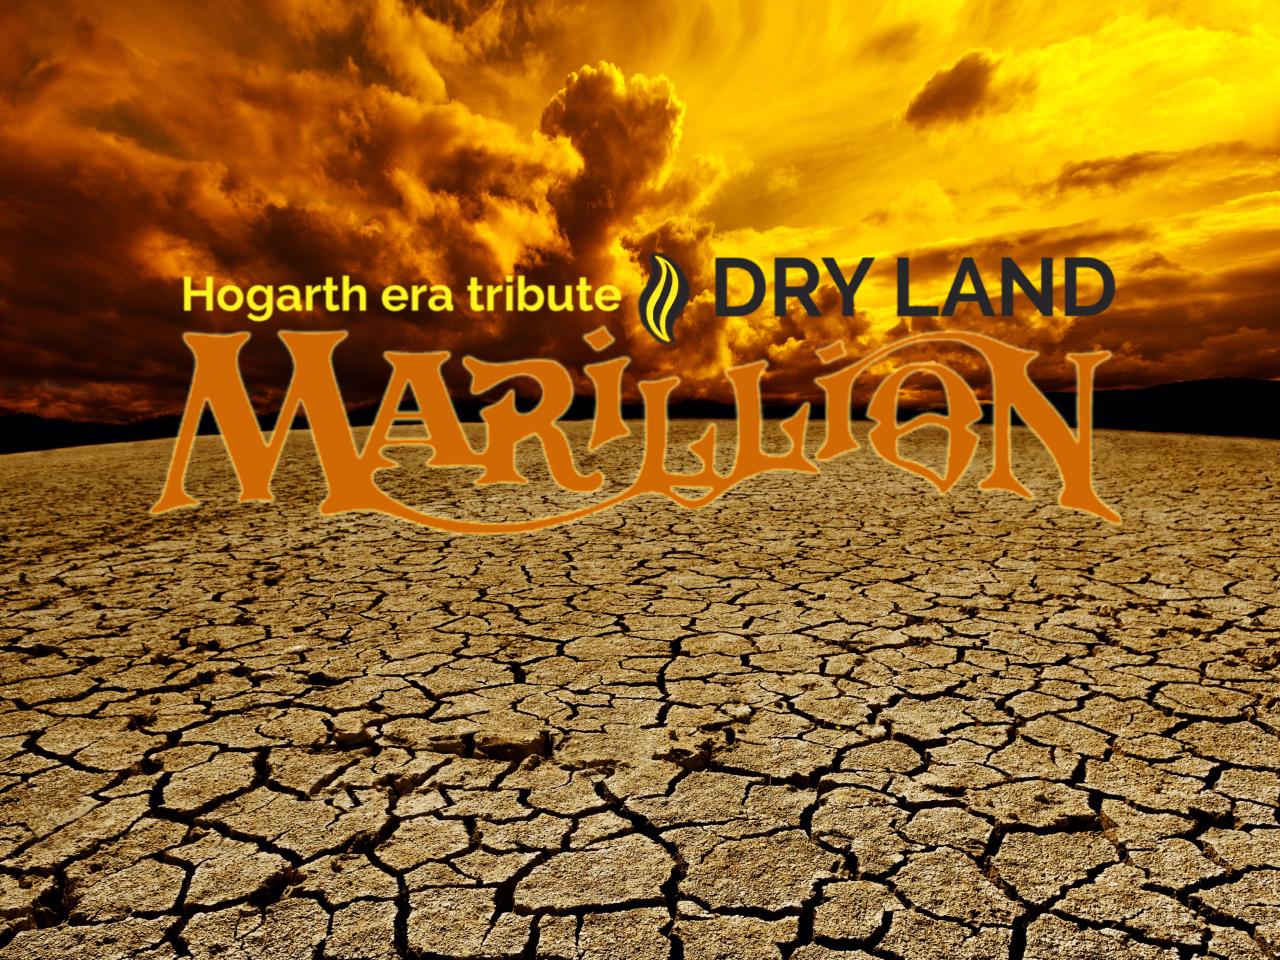 Dry land Marillion Tribute